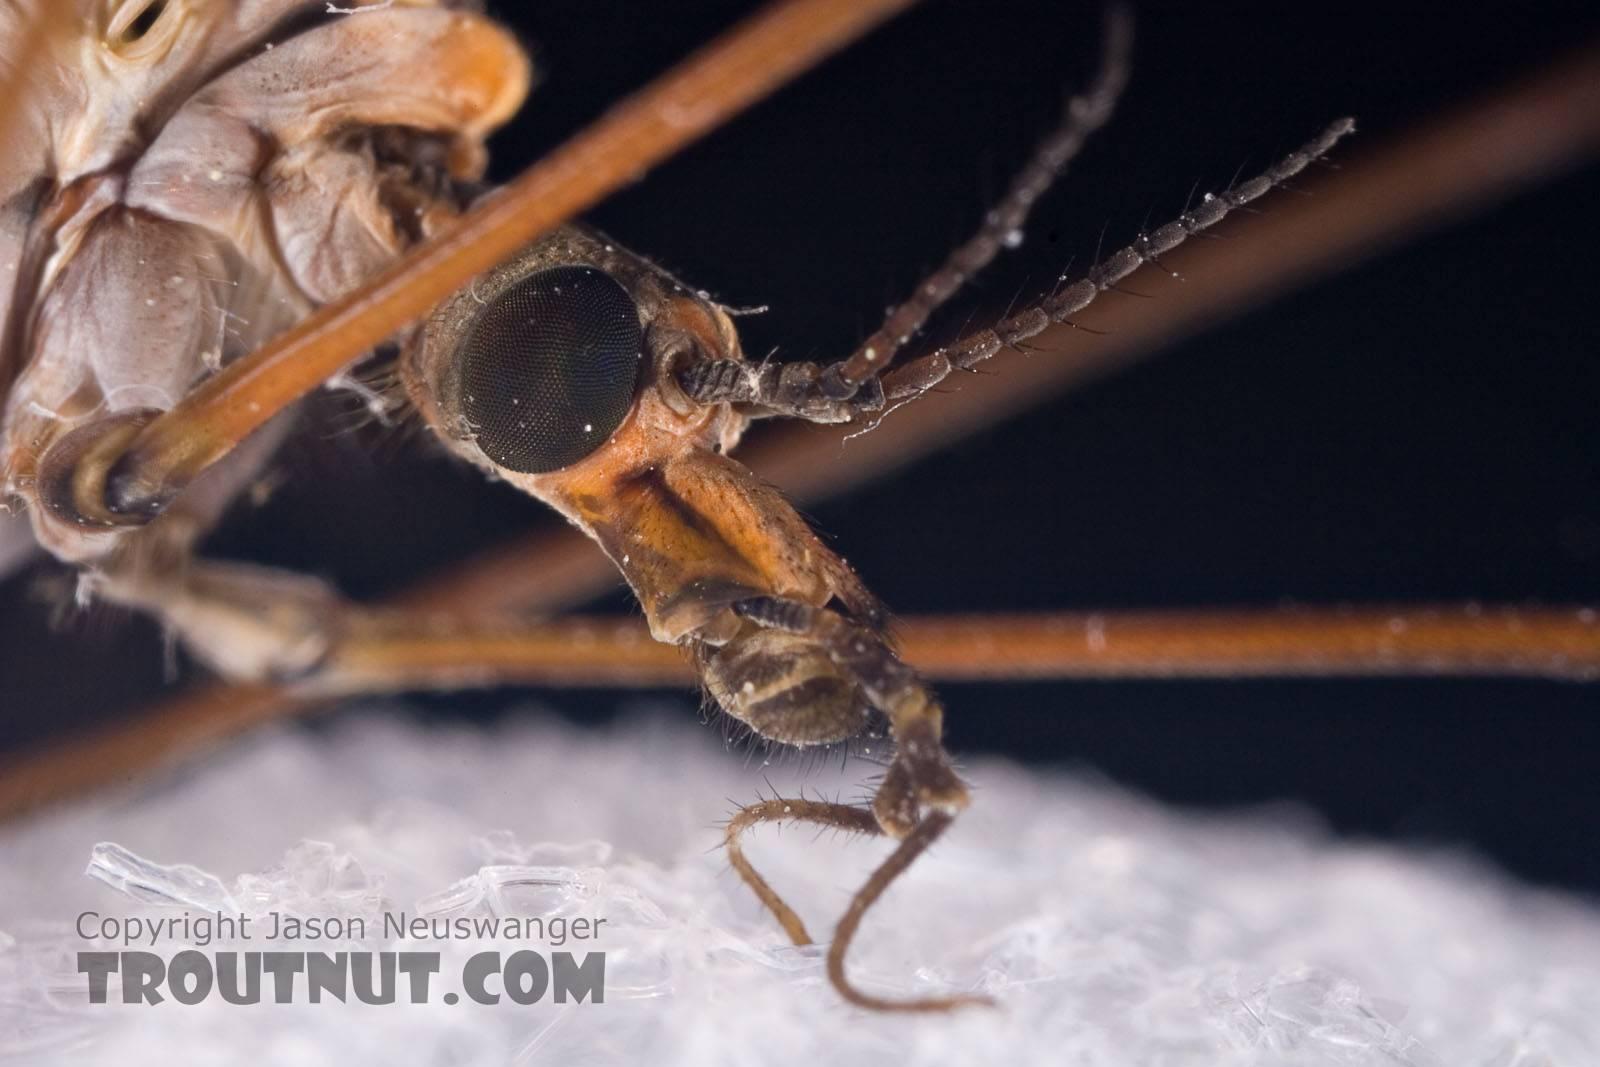 Tipulidae (Crane Flies) Crane Fly Adult from Brodhead Creek in Pennsylvania